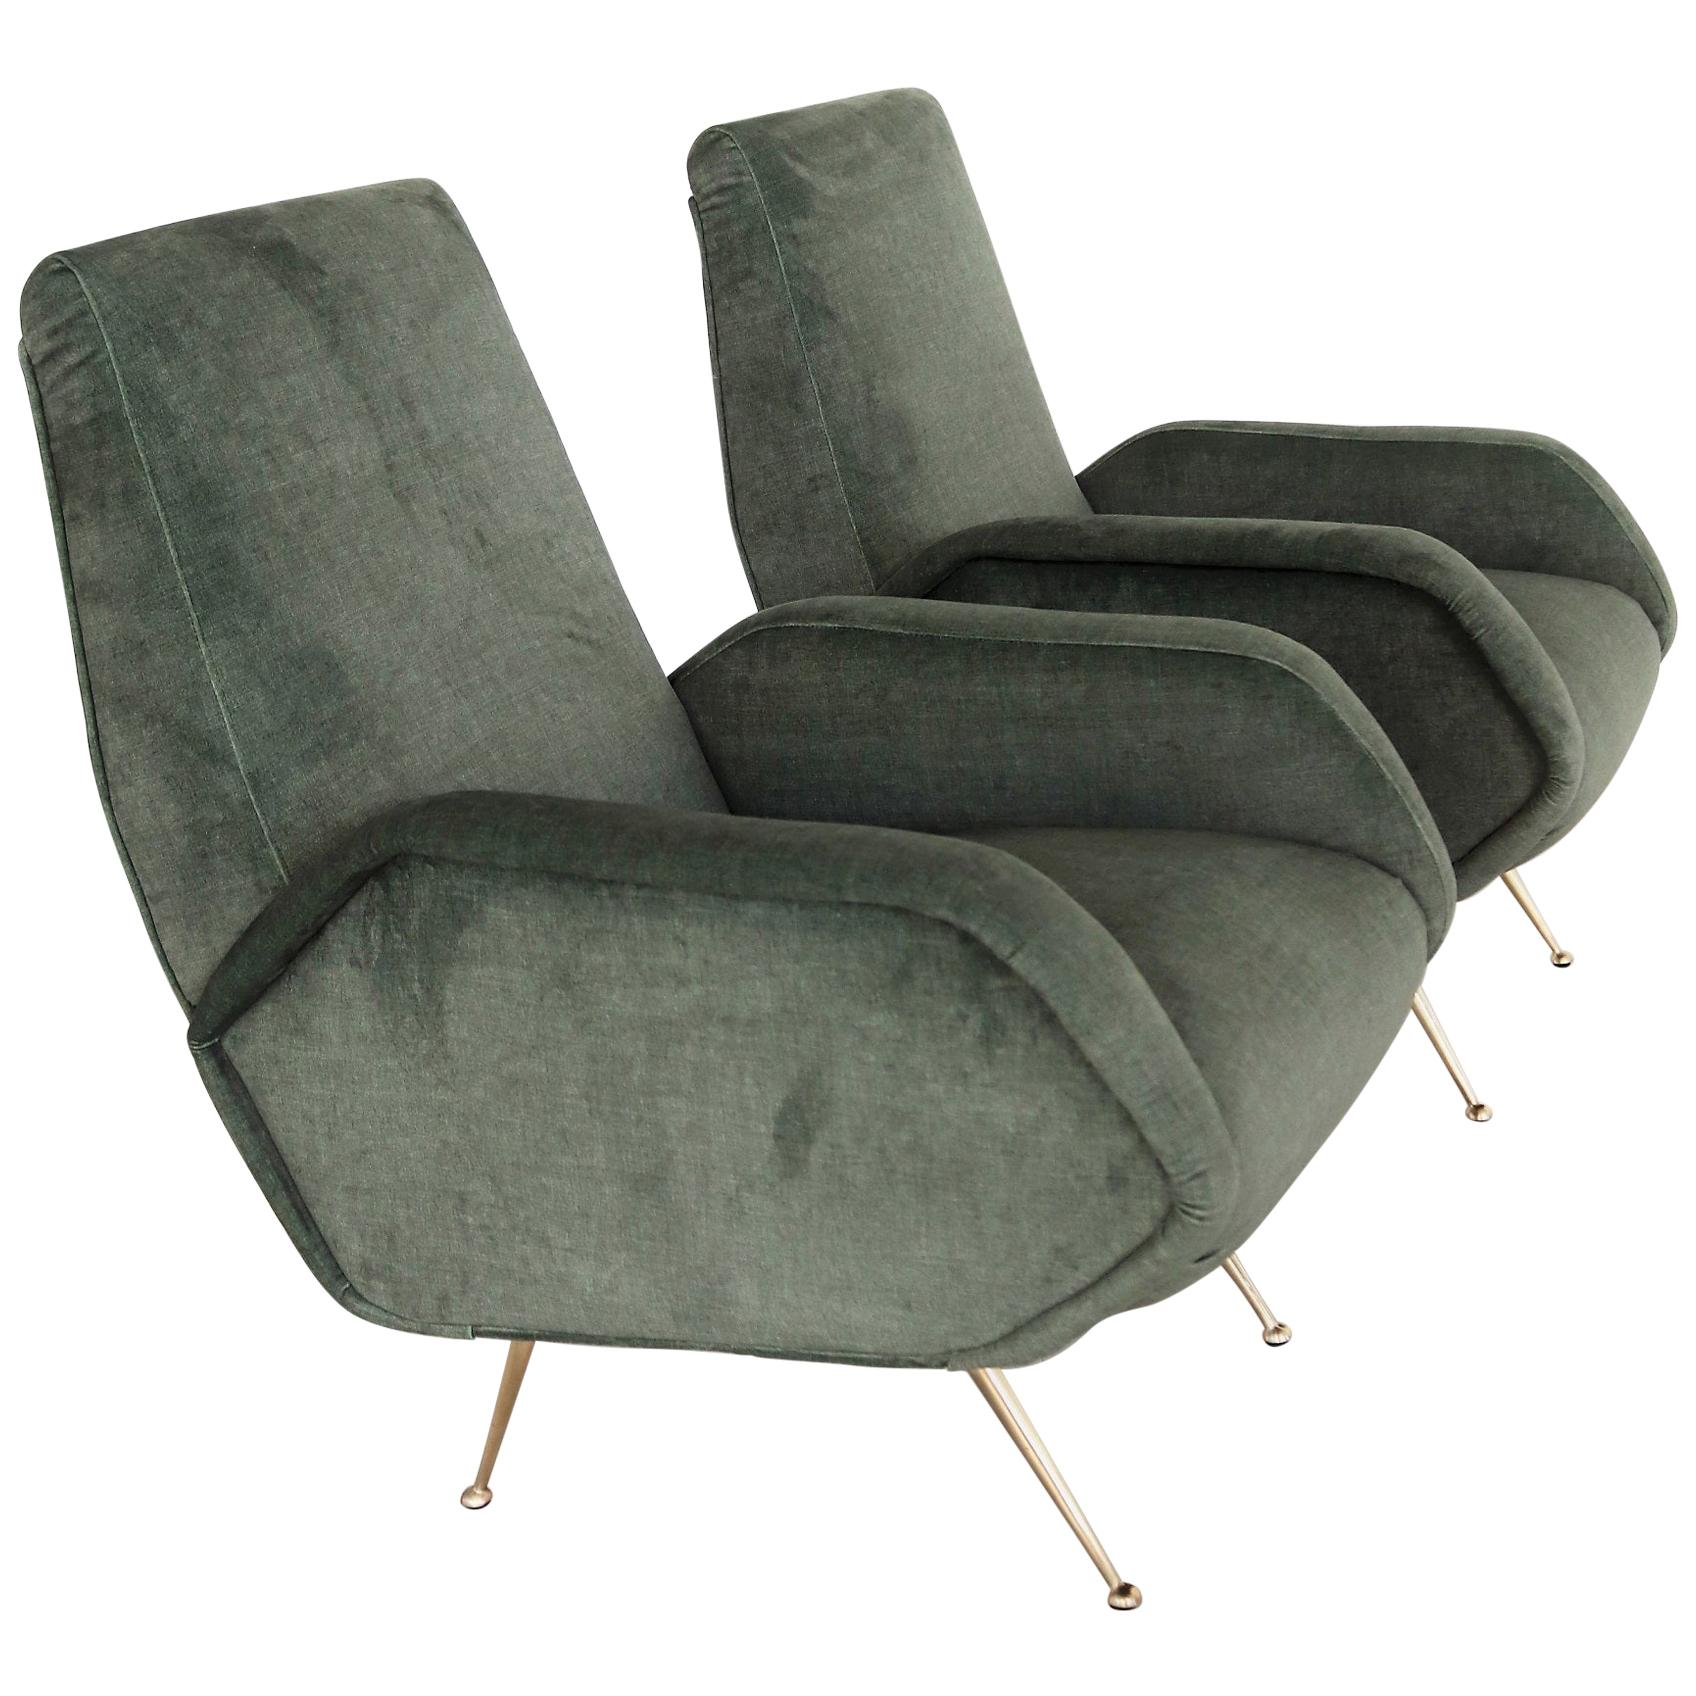 Italian Midcentury Armchairs Restored in Green Velvet with Brass Feet, 1950s